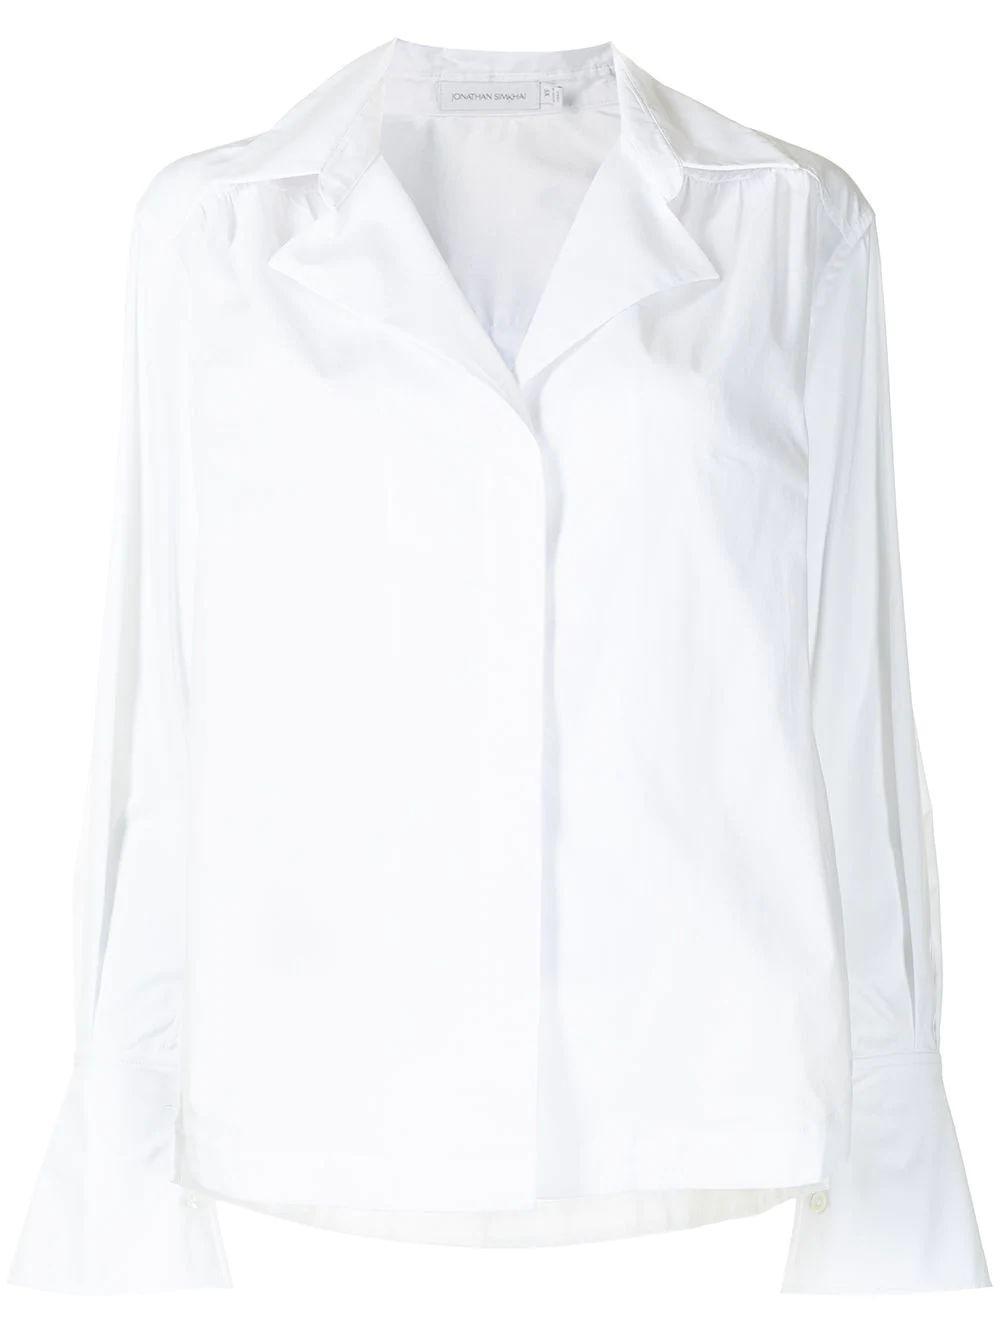 Evette Poplin Shirt